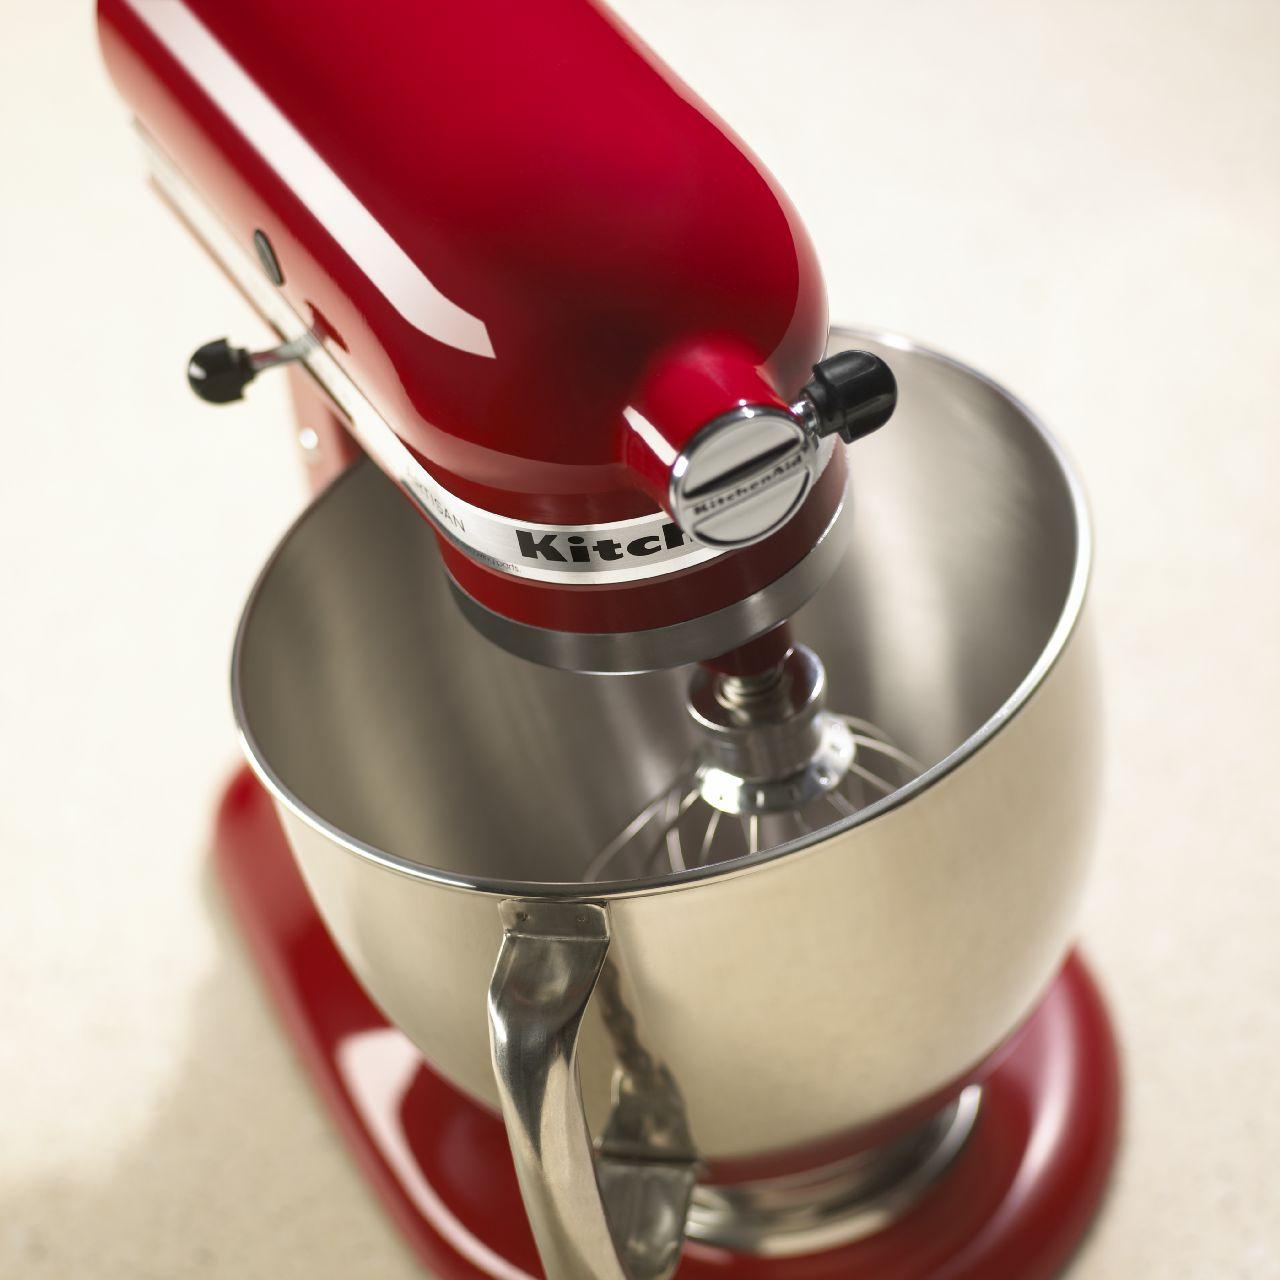 Kitchenaid artisan series 5 quart tilt head stand mixer ebay - Kitchenaid artisan qt stand mixer sale ...